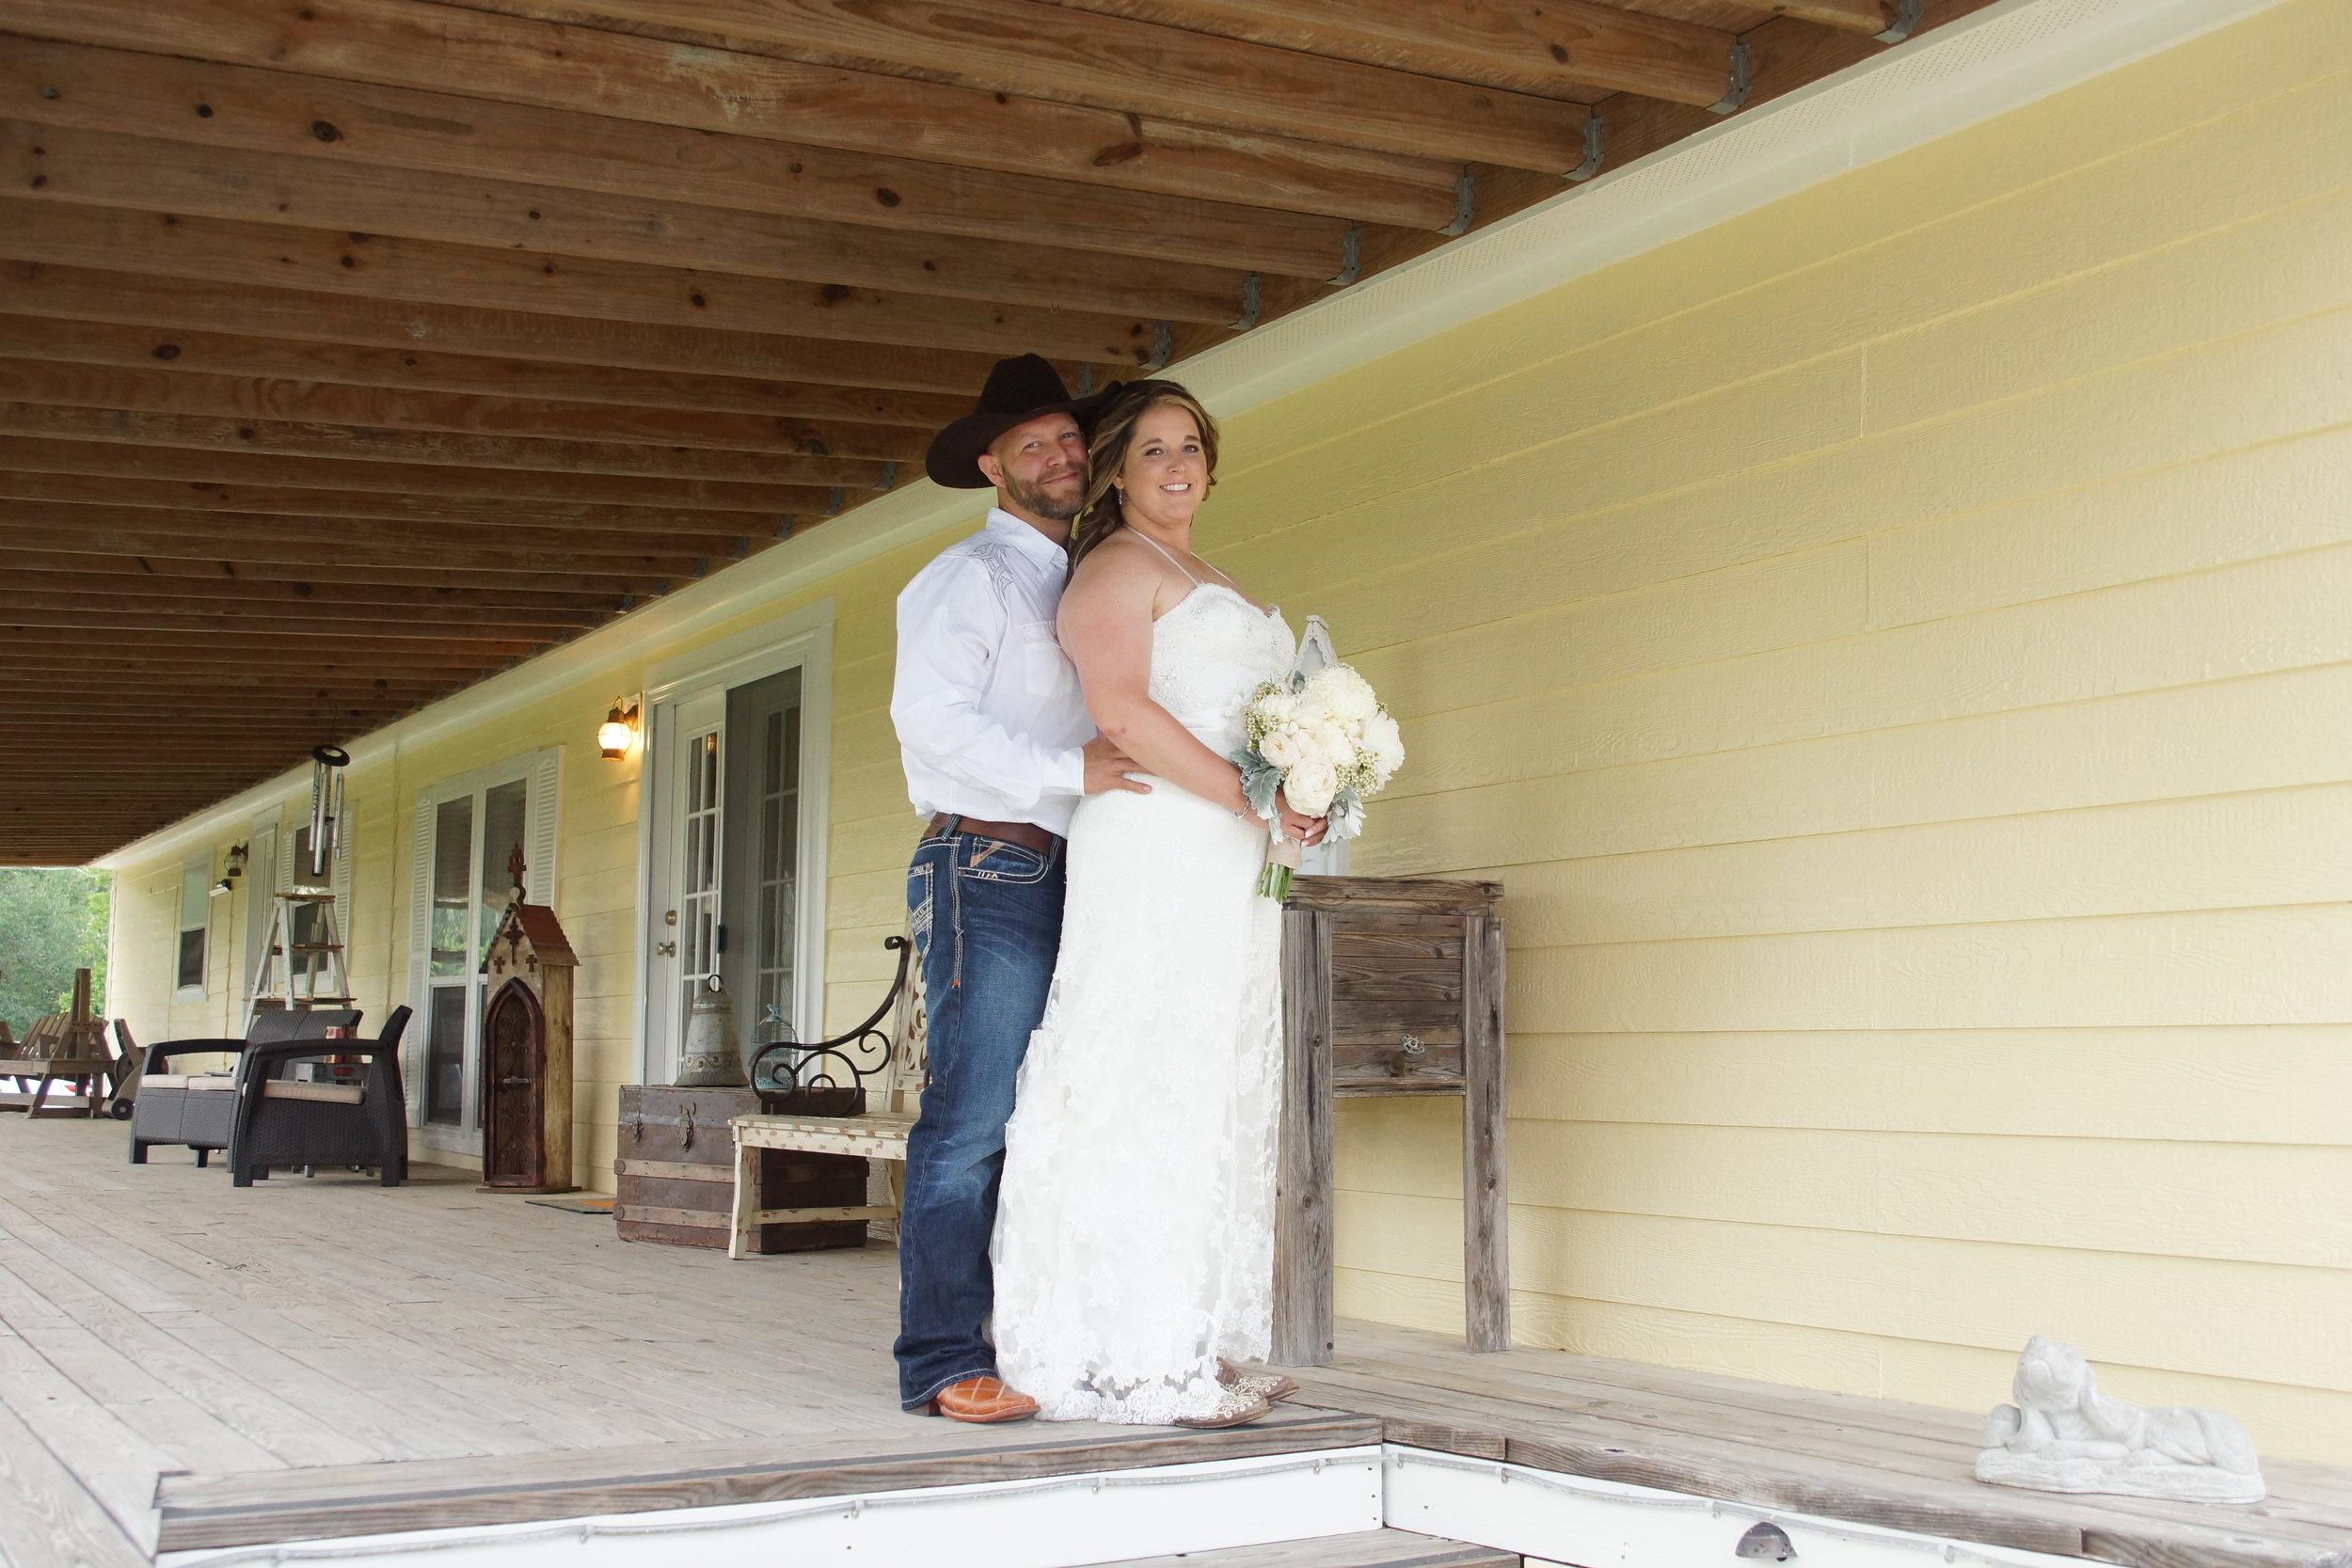 Why not wear Denim Jeans? | Casual Wedding Ideas